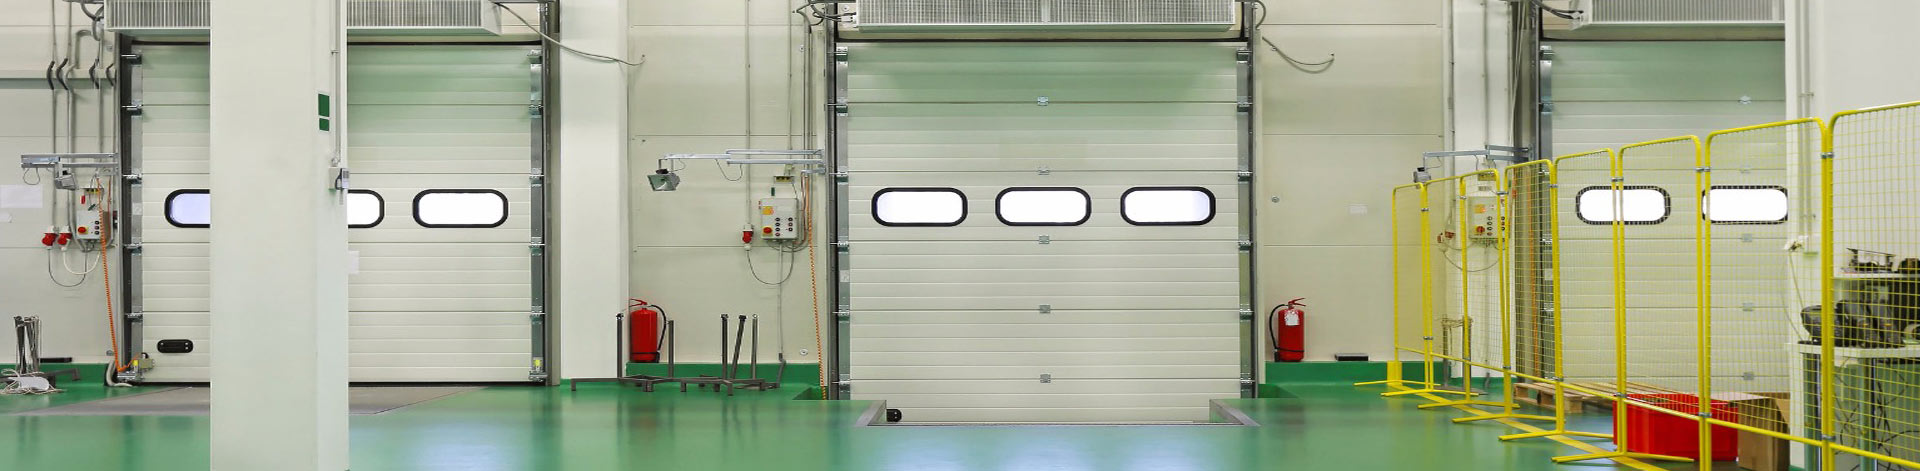 Commercial overhead doors in brooklyn ny commercial overhead door install rubansaba